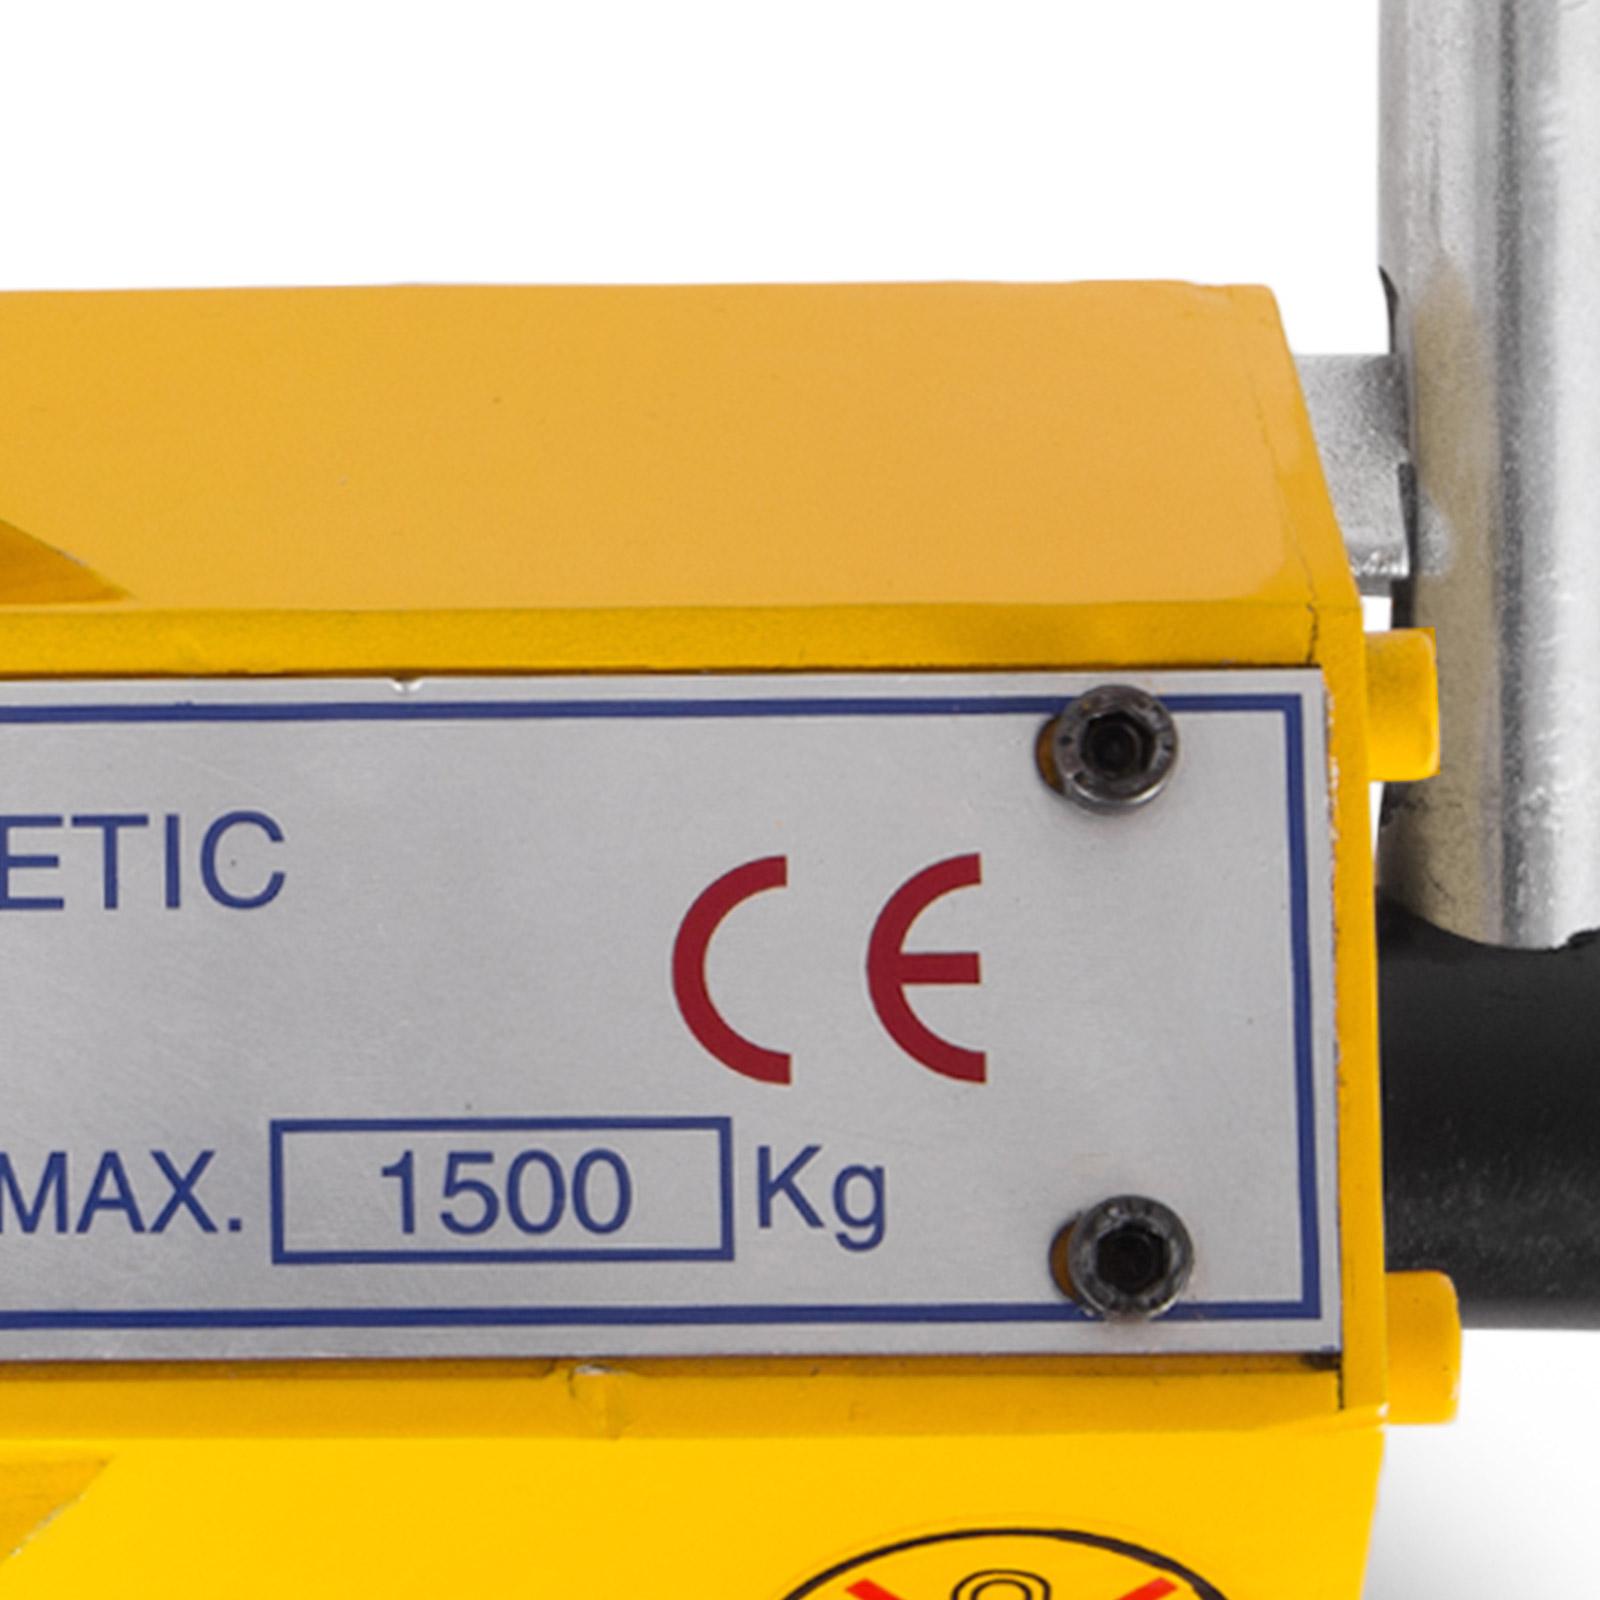 100-300-600-1000KG-Steel-Magnetic-Lifter-Heavy-Duty-Crane-Hoist-Lifting-Magnet miniature 82